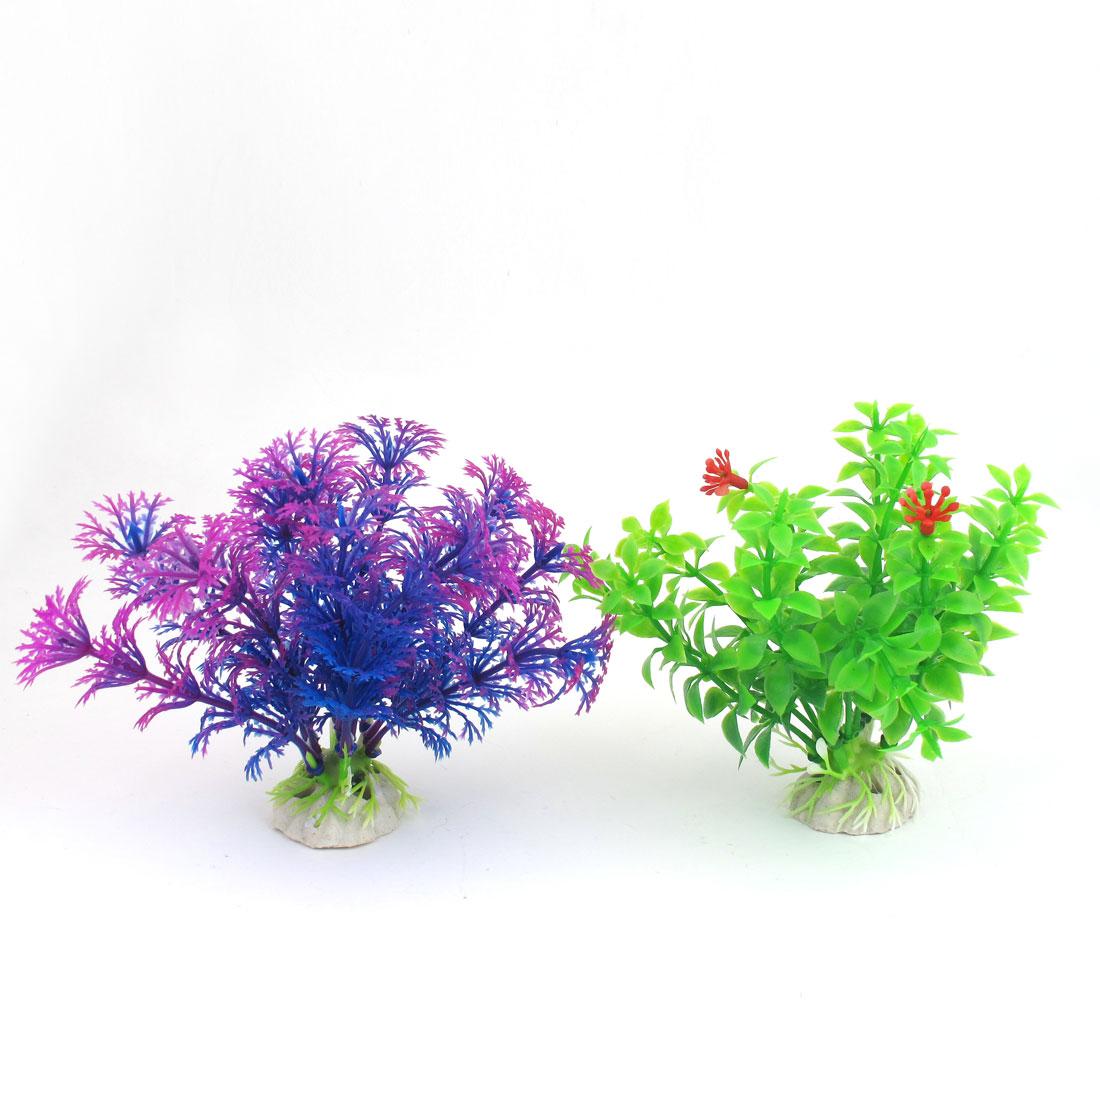 "2 Pcs 4.3"" High Green Fuchsia Blue Emulational Aquarium Fish Tank Plants Decor"